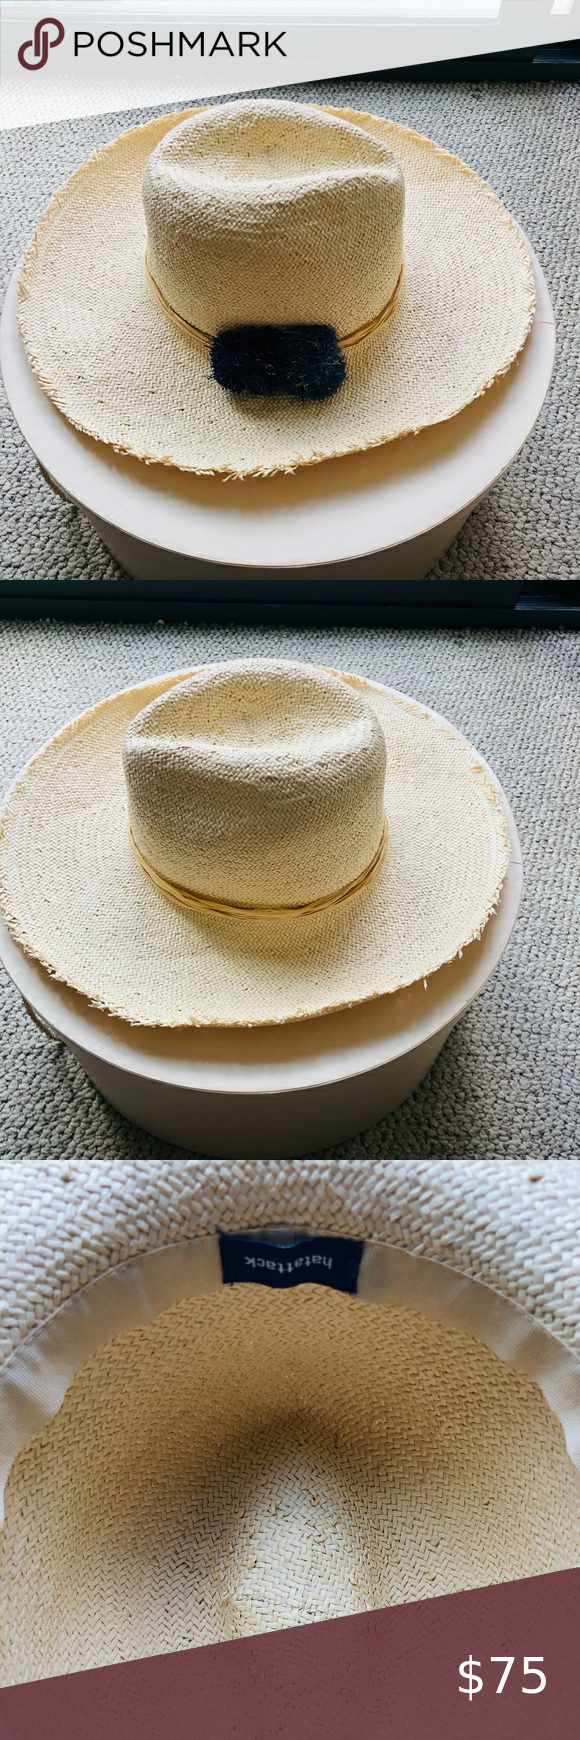 Hat Attack Cuppajyo Fringe Raffia Pom Hat Pom Pom Hat Pom Pom Blue Pom Poms